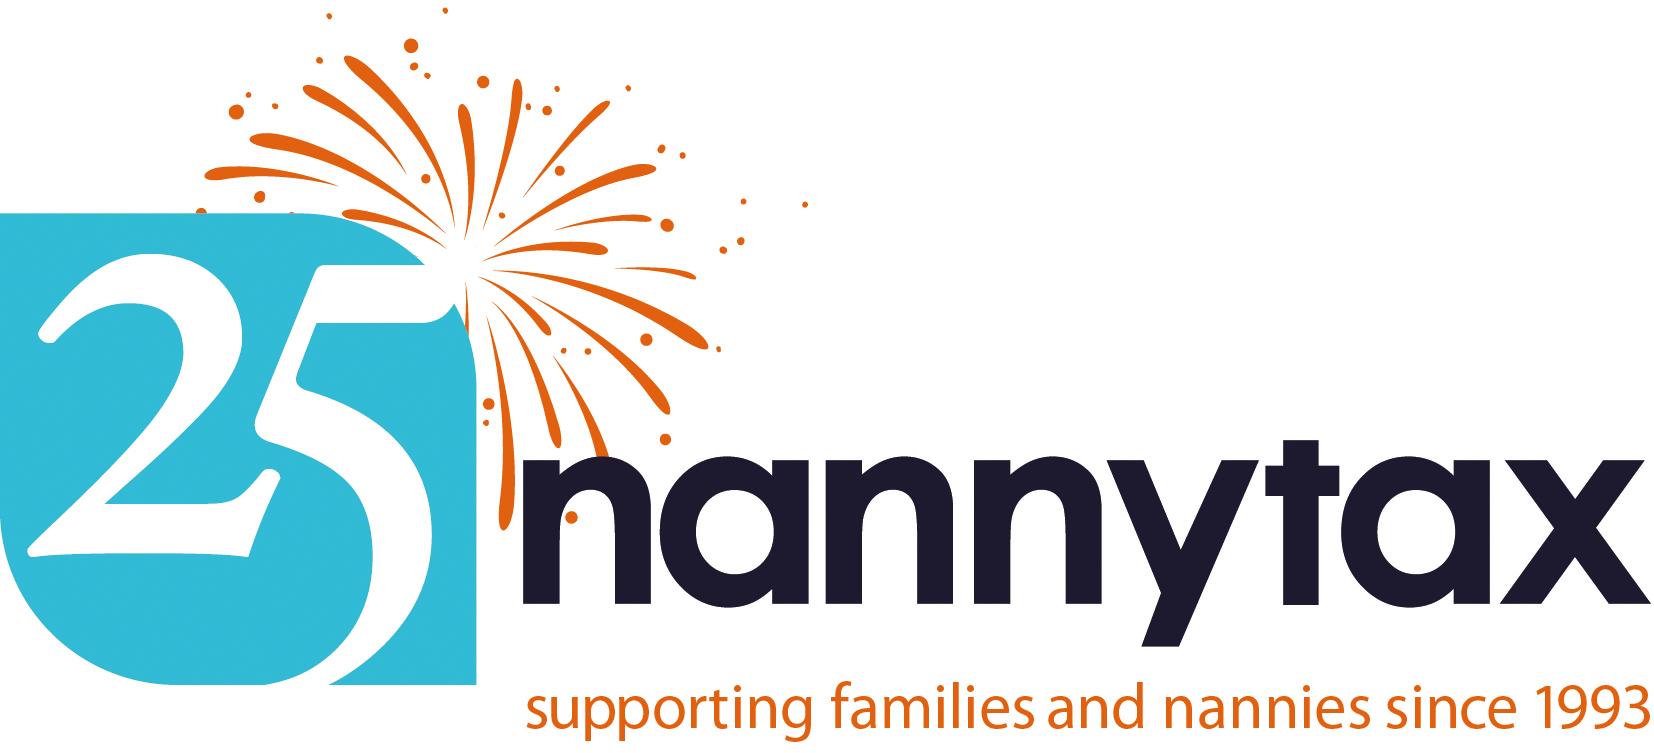 Tax- Free Child Care Nannytax